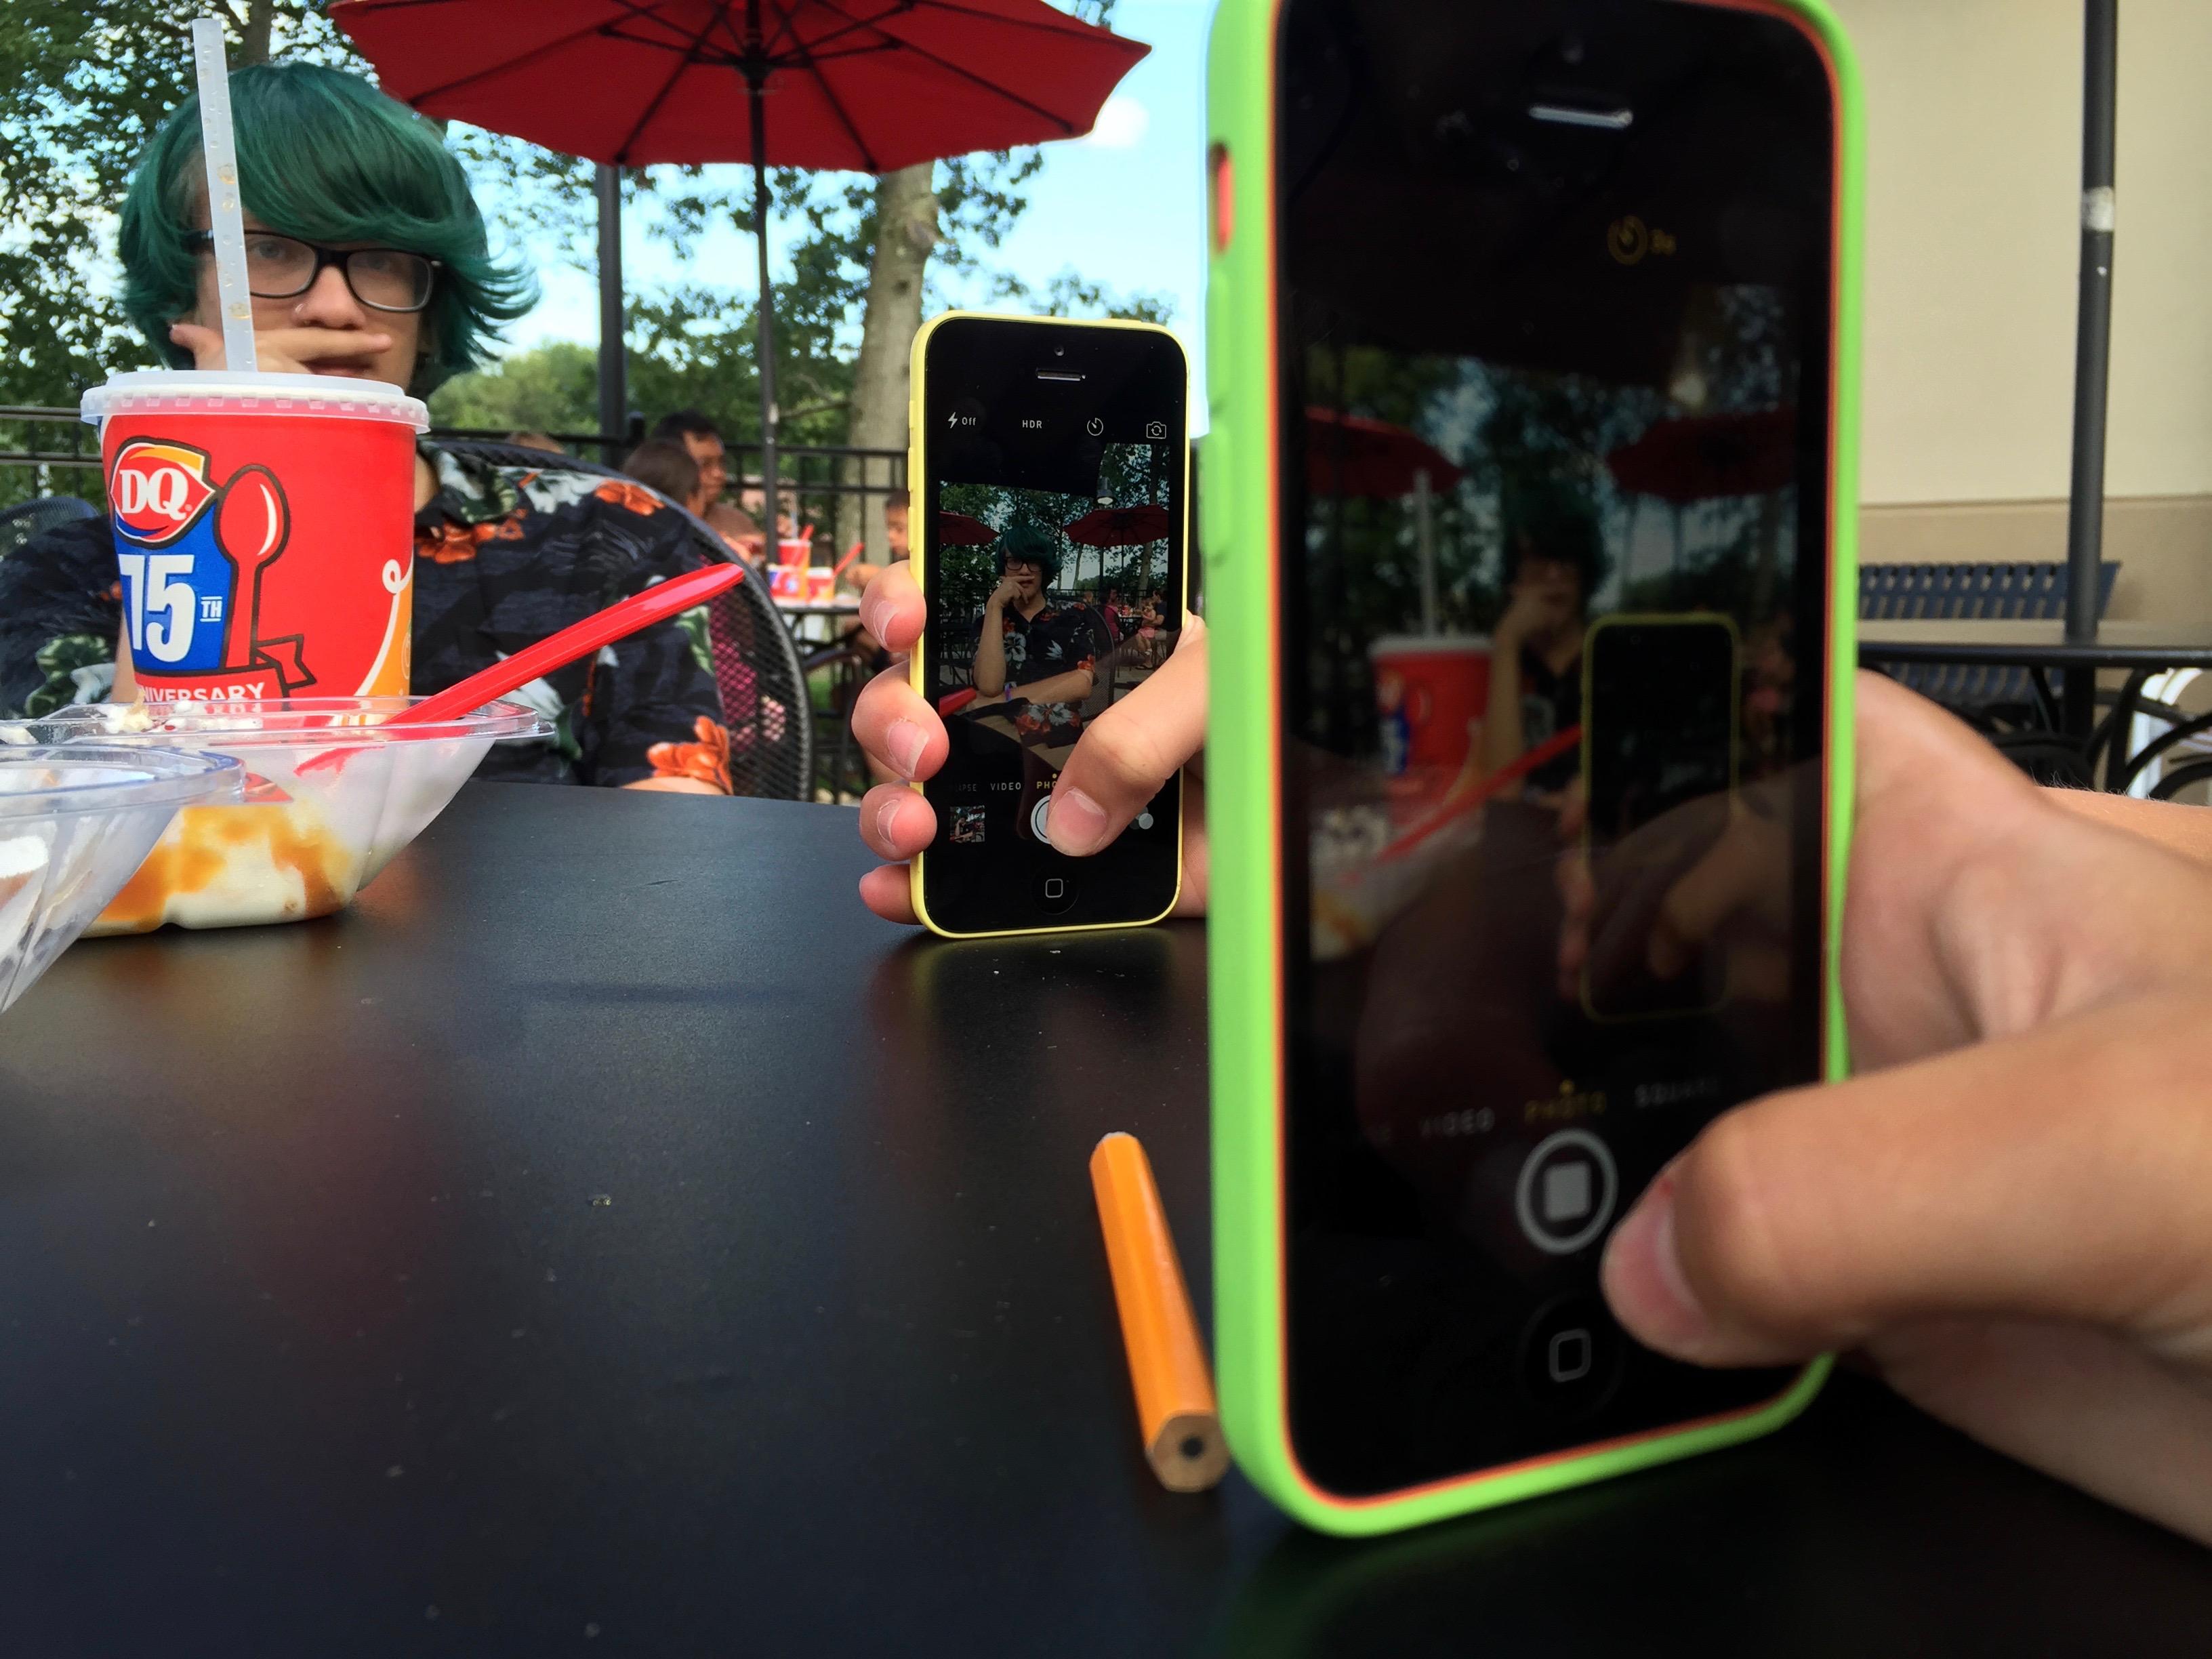 Iphone 3^